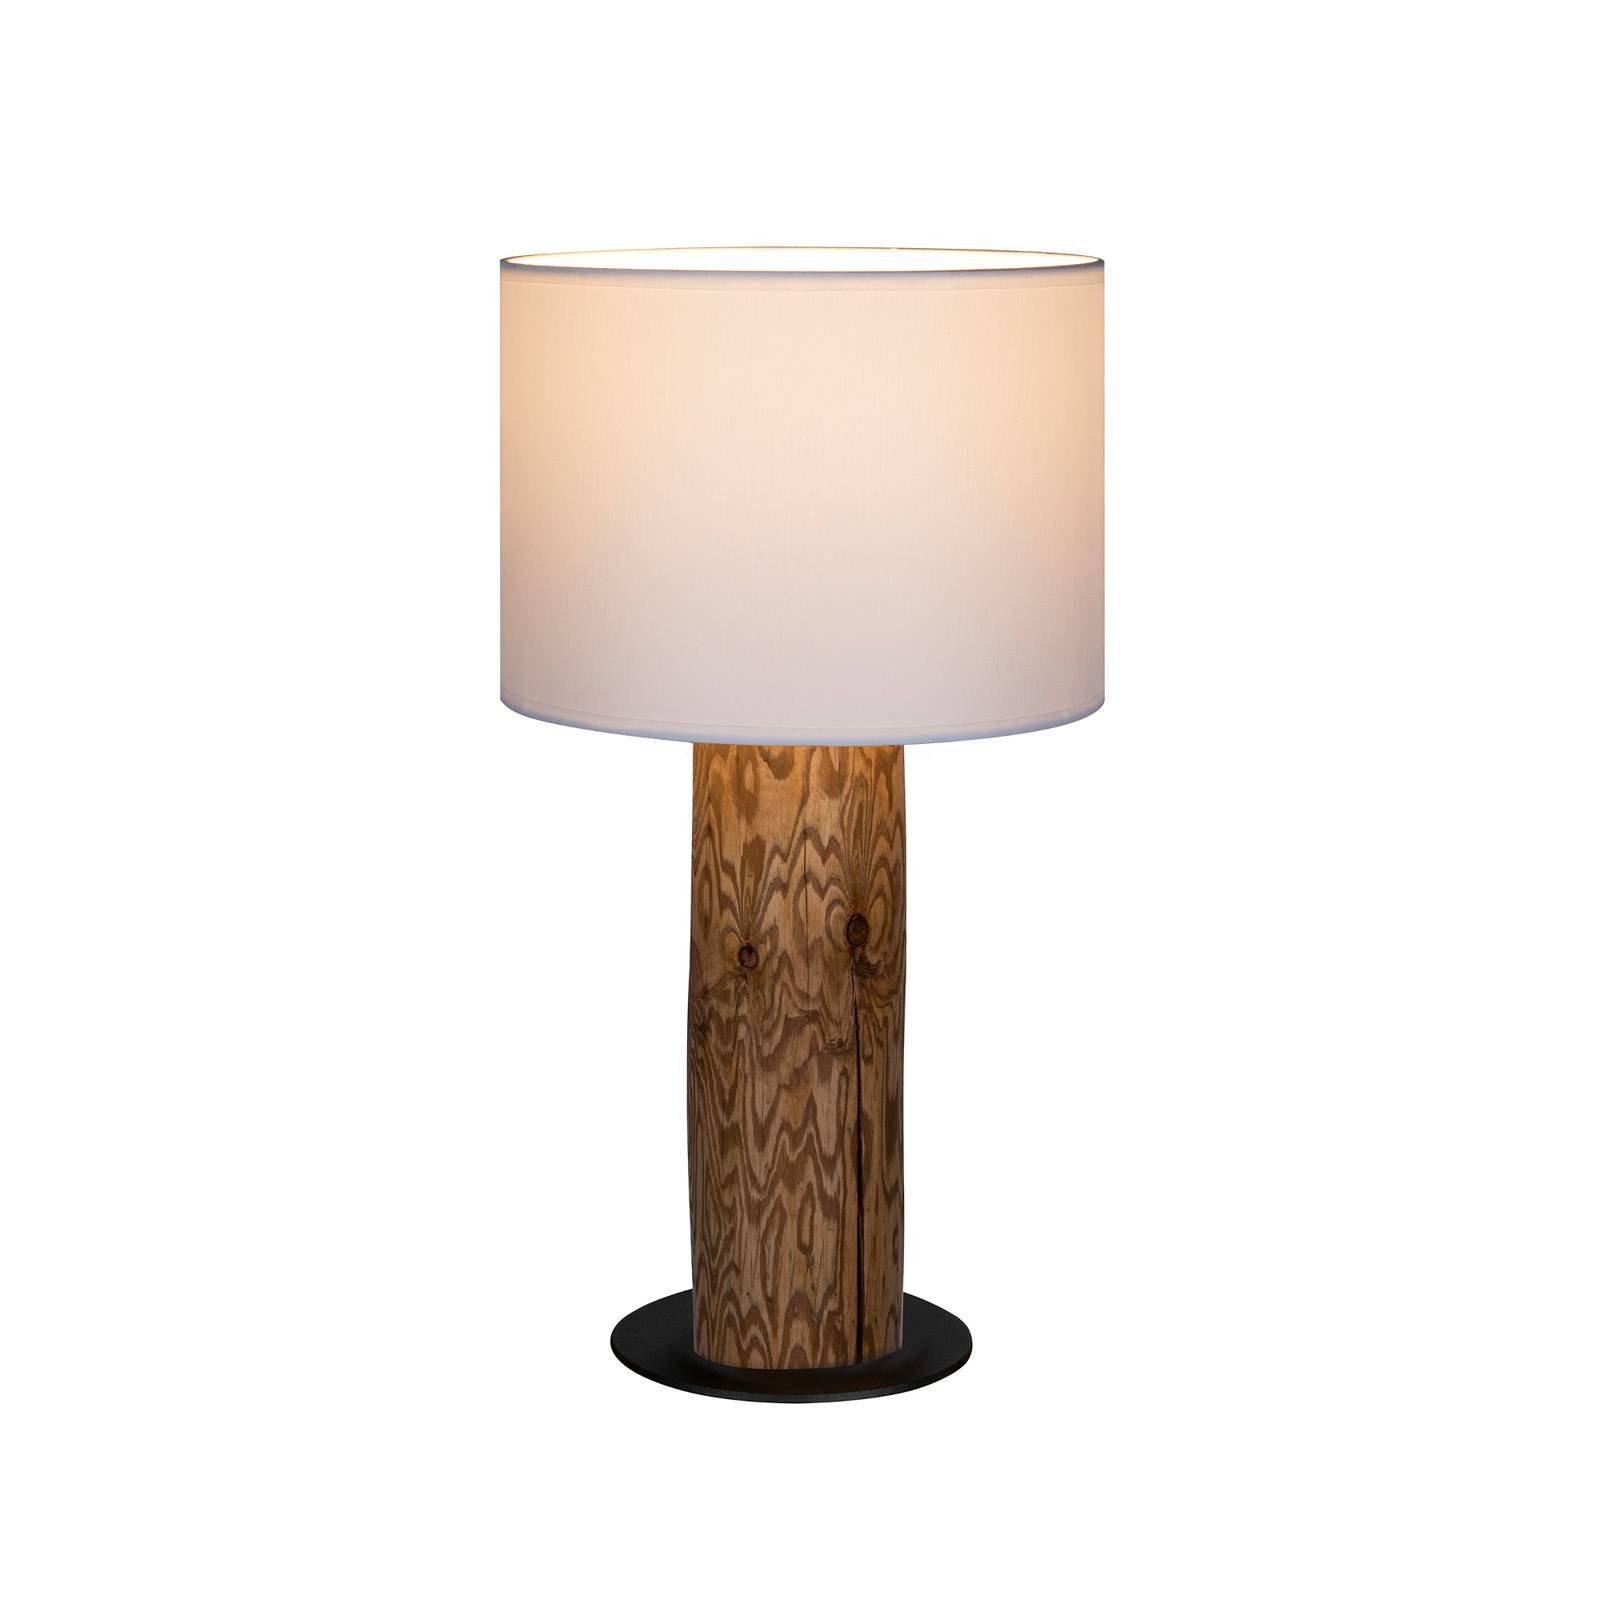 Bordlampe Pino Simple, skjerm hvit, fot brun